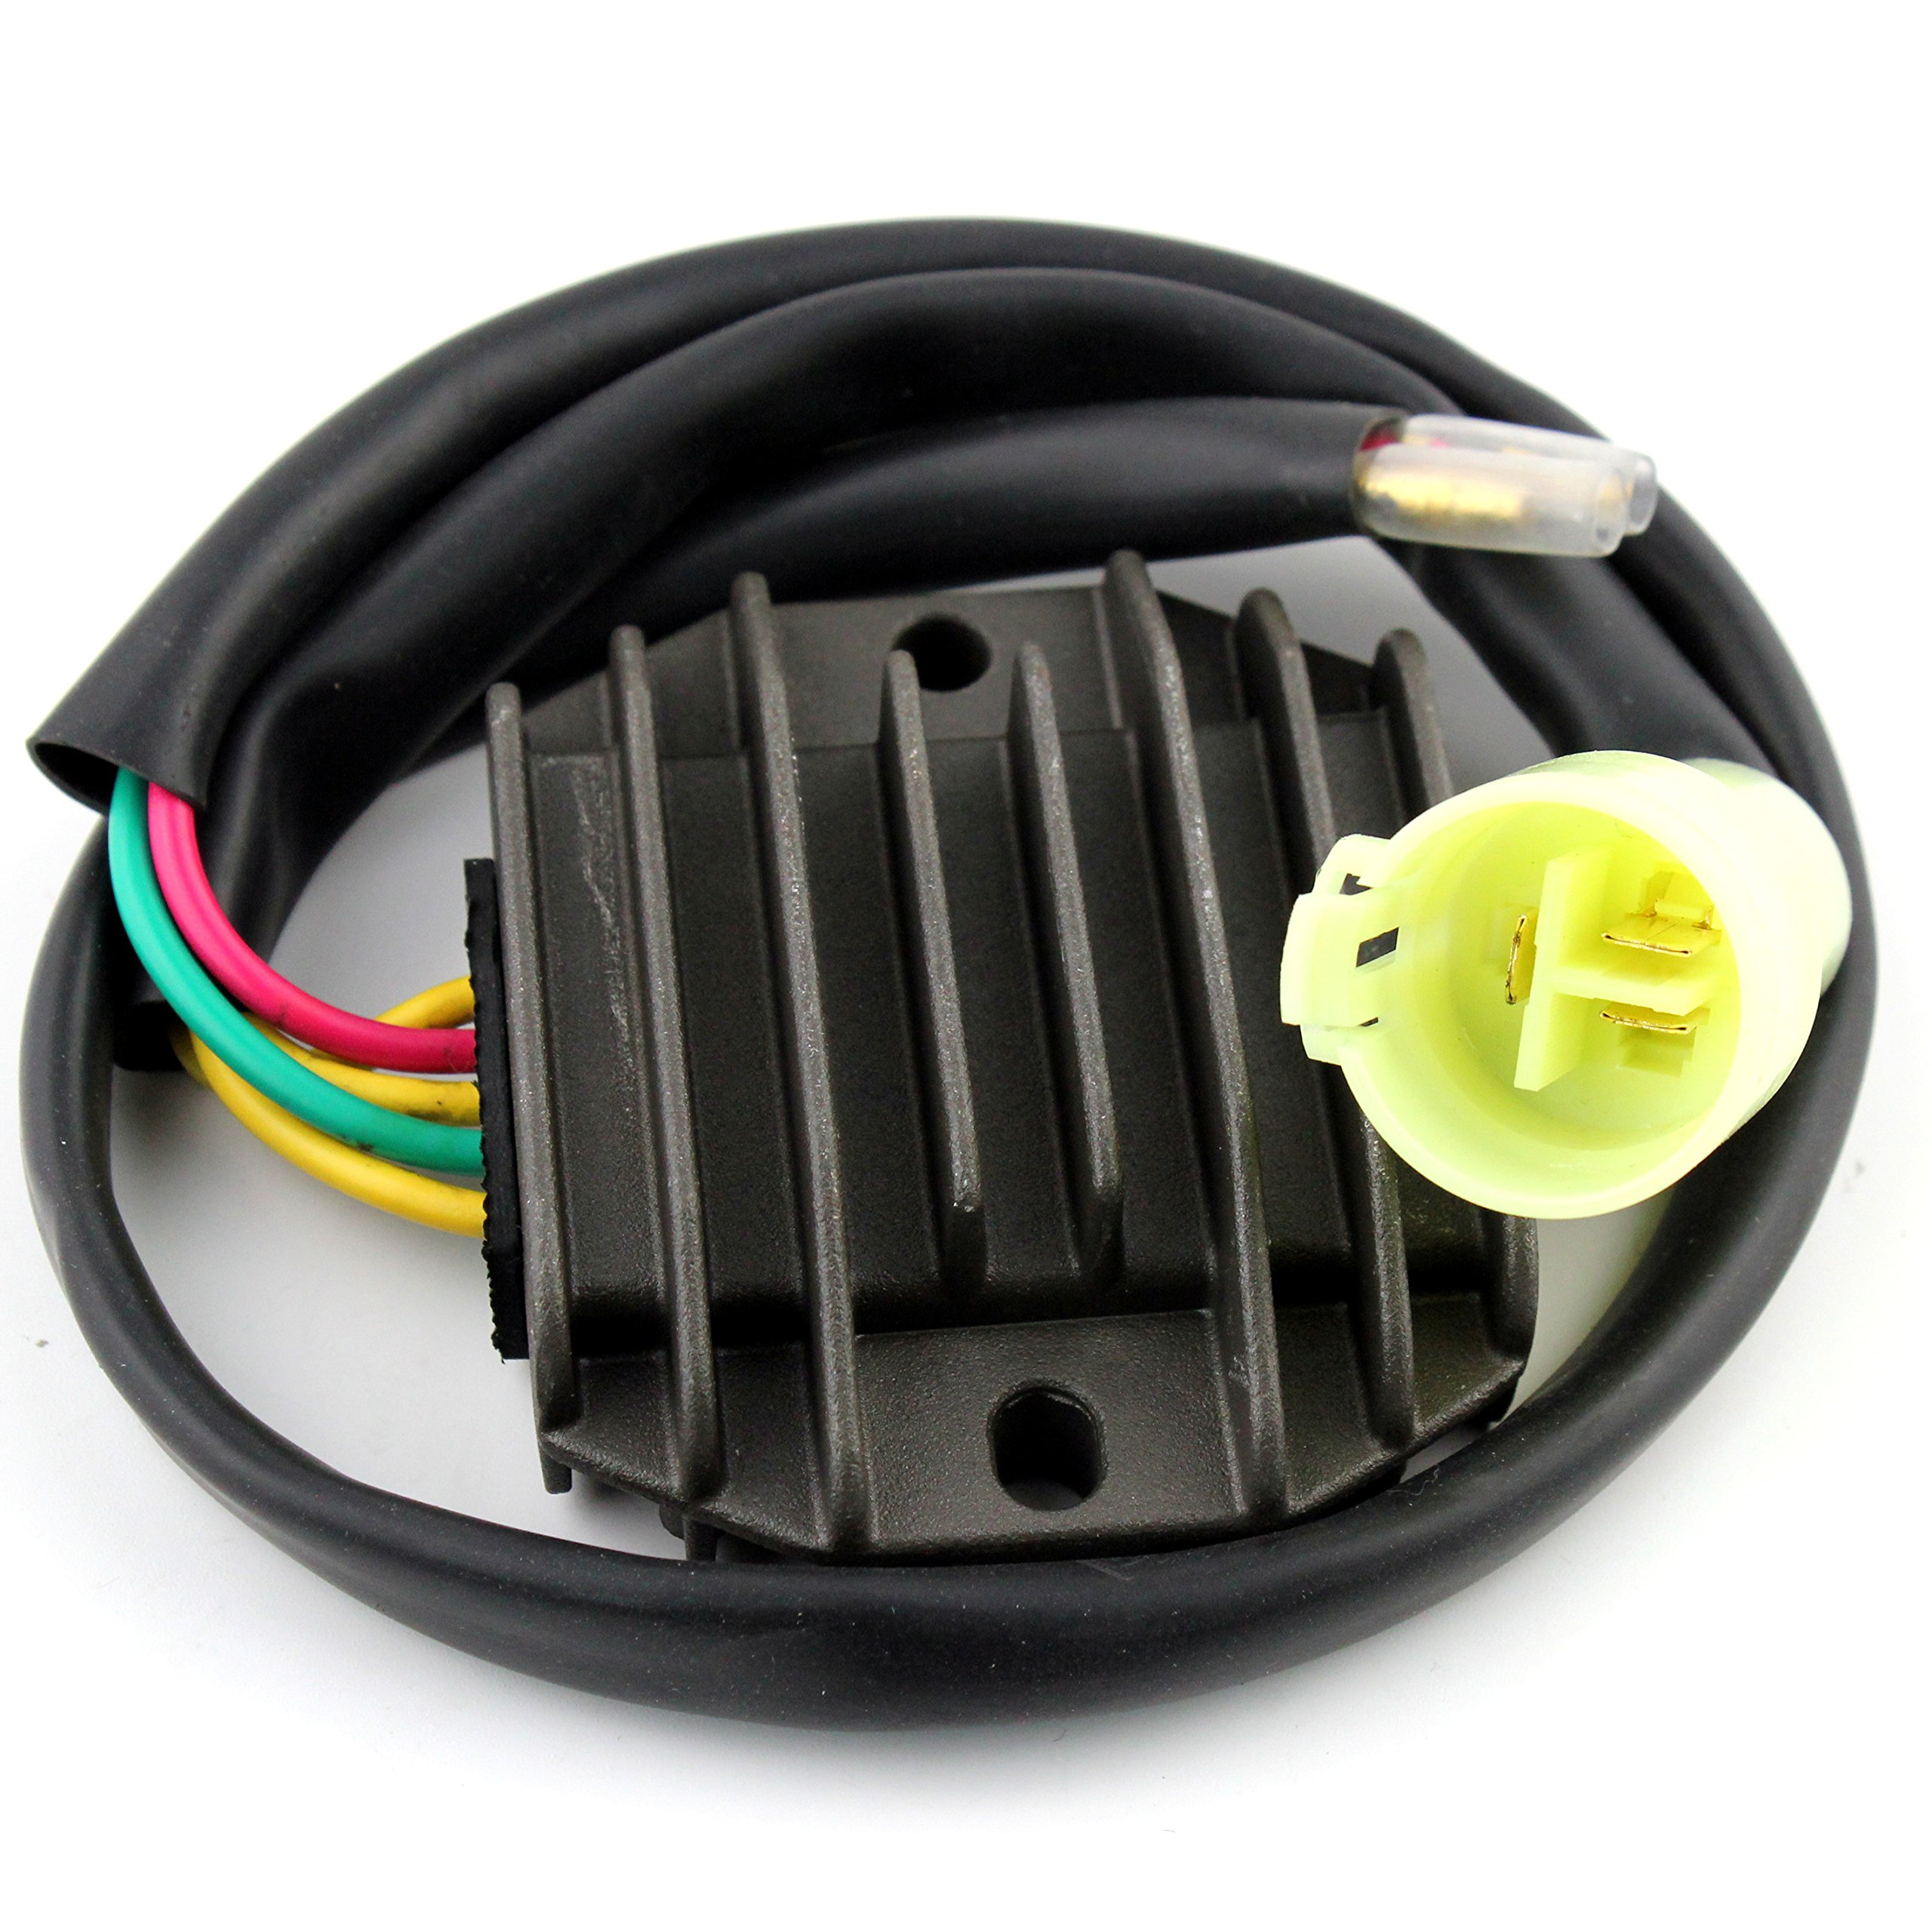 Voltage Regulator Rectifier For Honda TRX 300 Fourtrax TRX300 1993-2000 OEM Repl.# 31600-HC5-970 31600-HM5-630